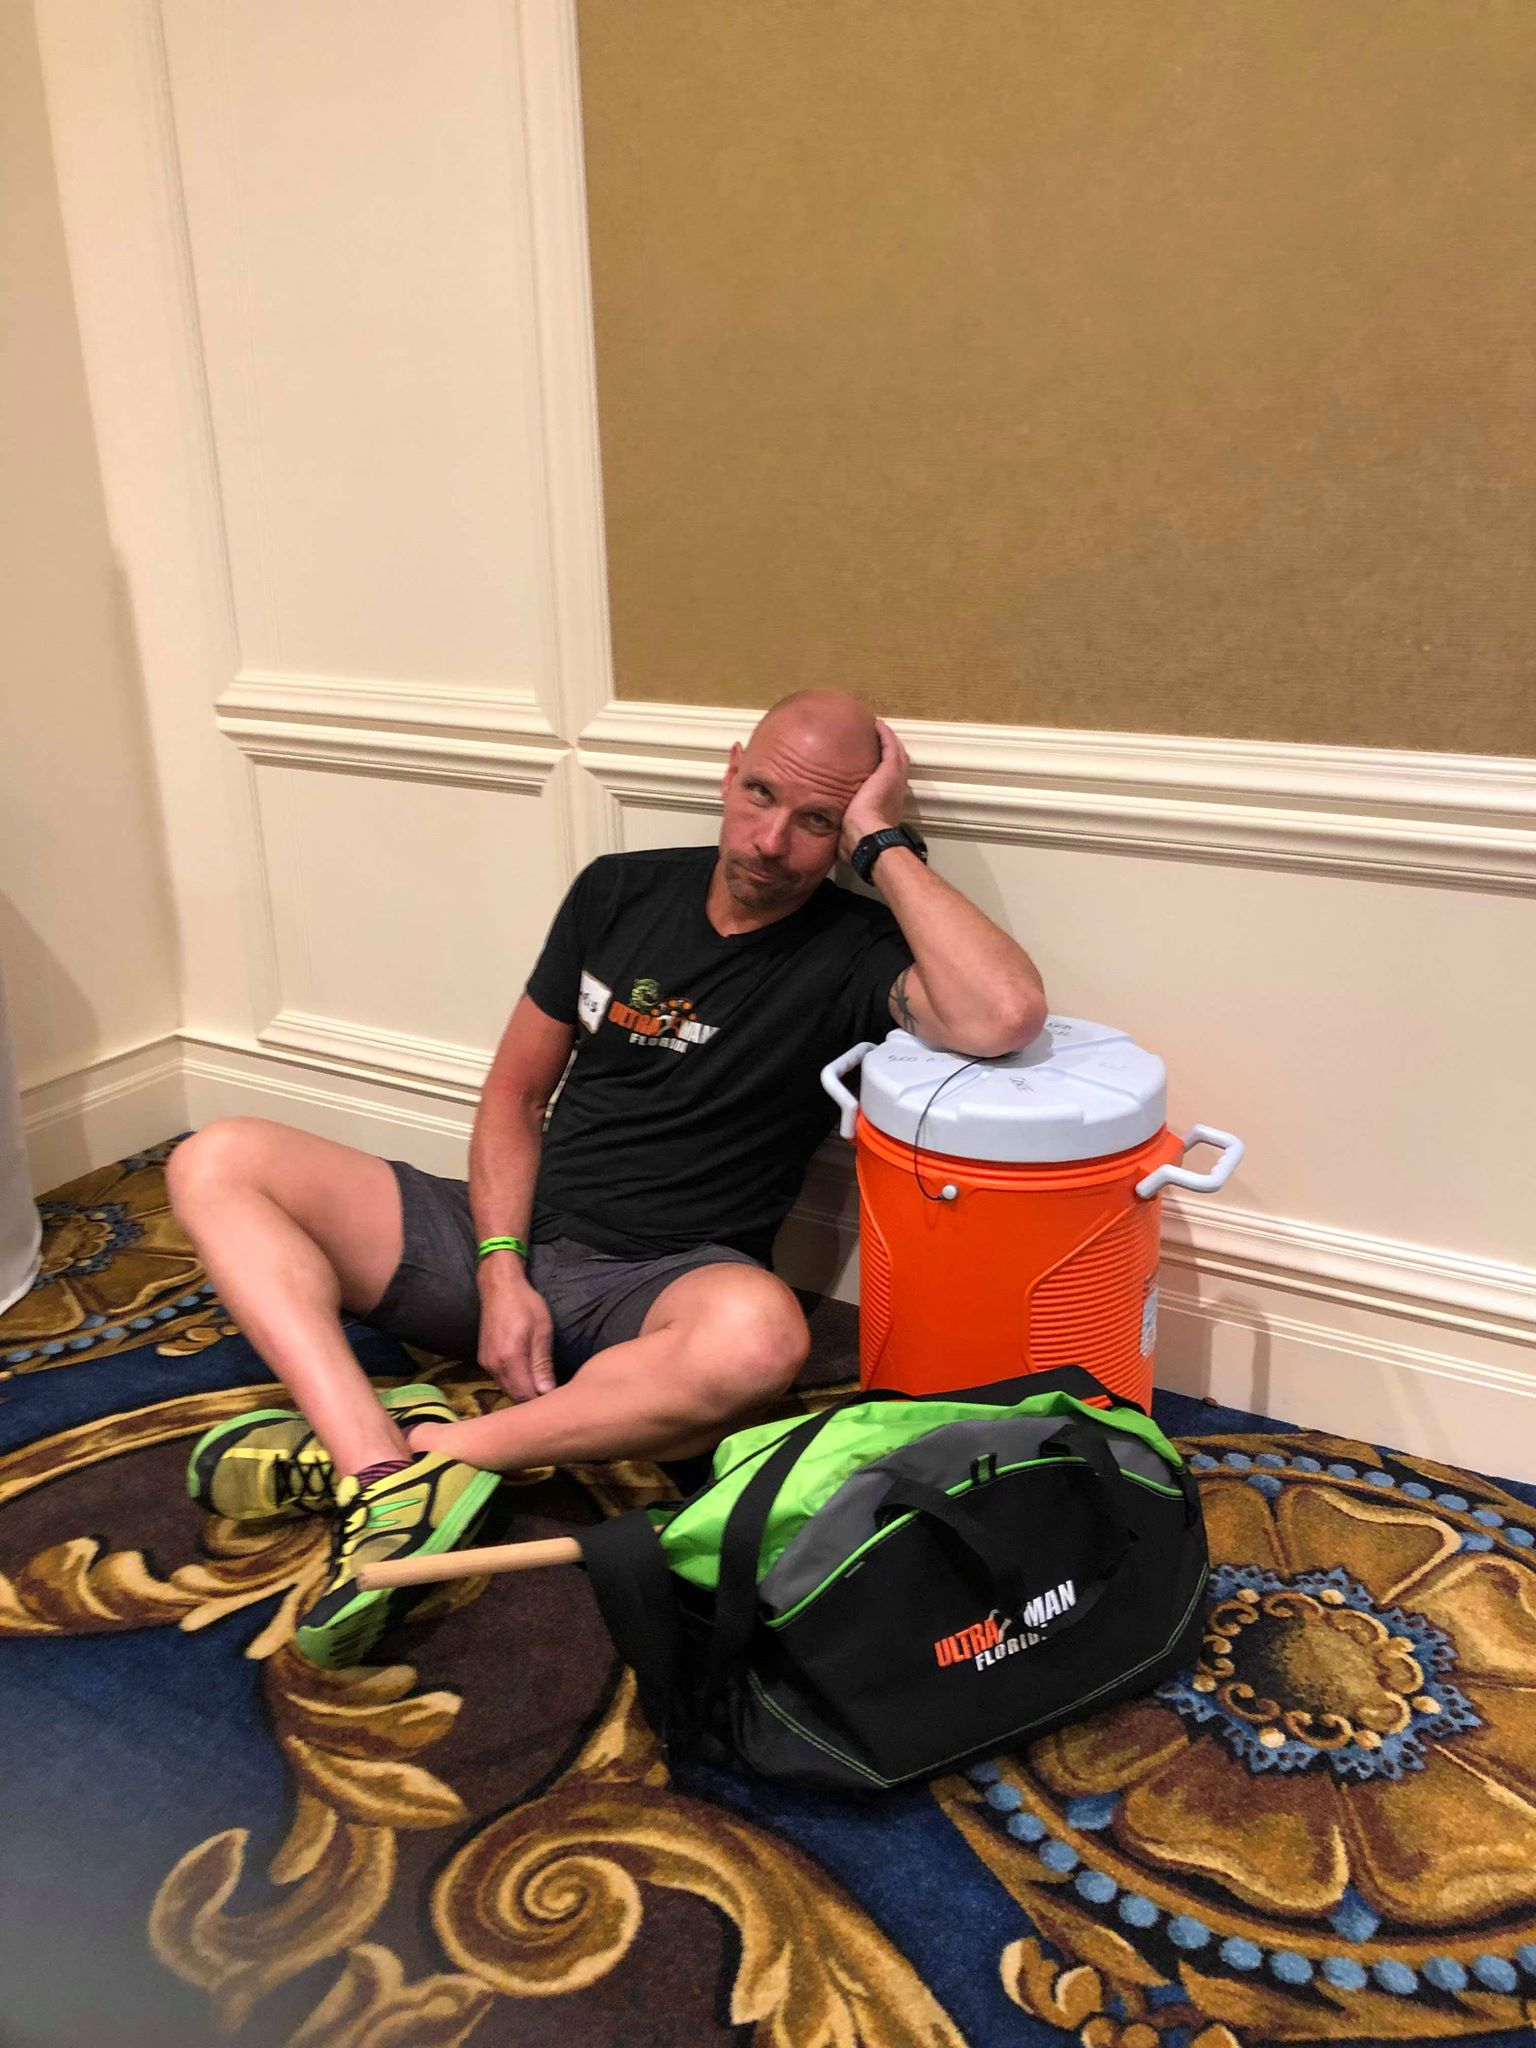 Coach_Terry_Wilson_Pursuit_of_The_Perfect_Race_Ultraman_Florida_Chris_Pollack_7.jpg